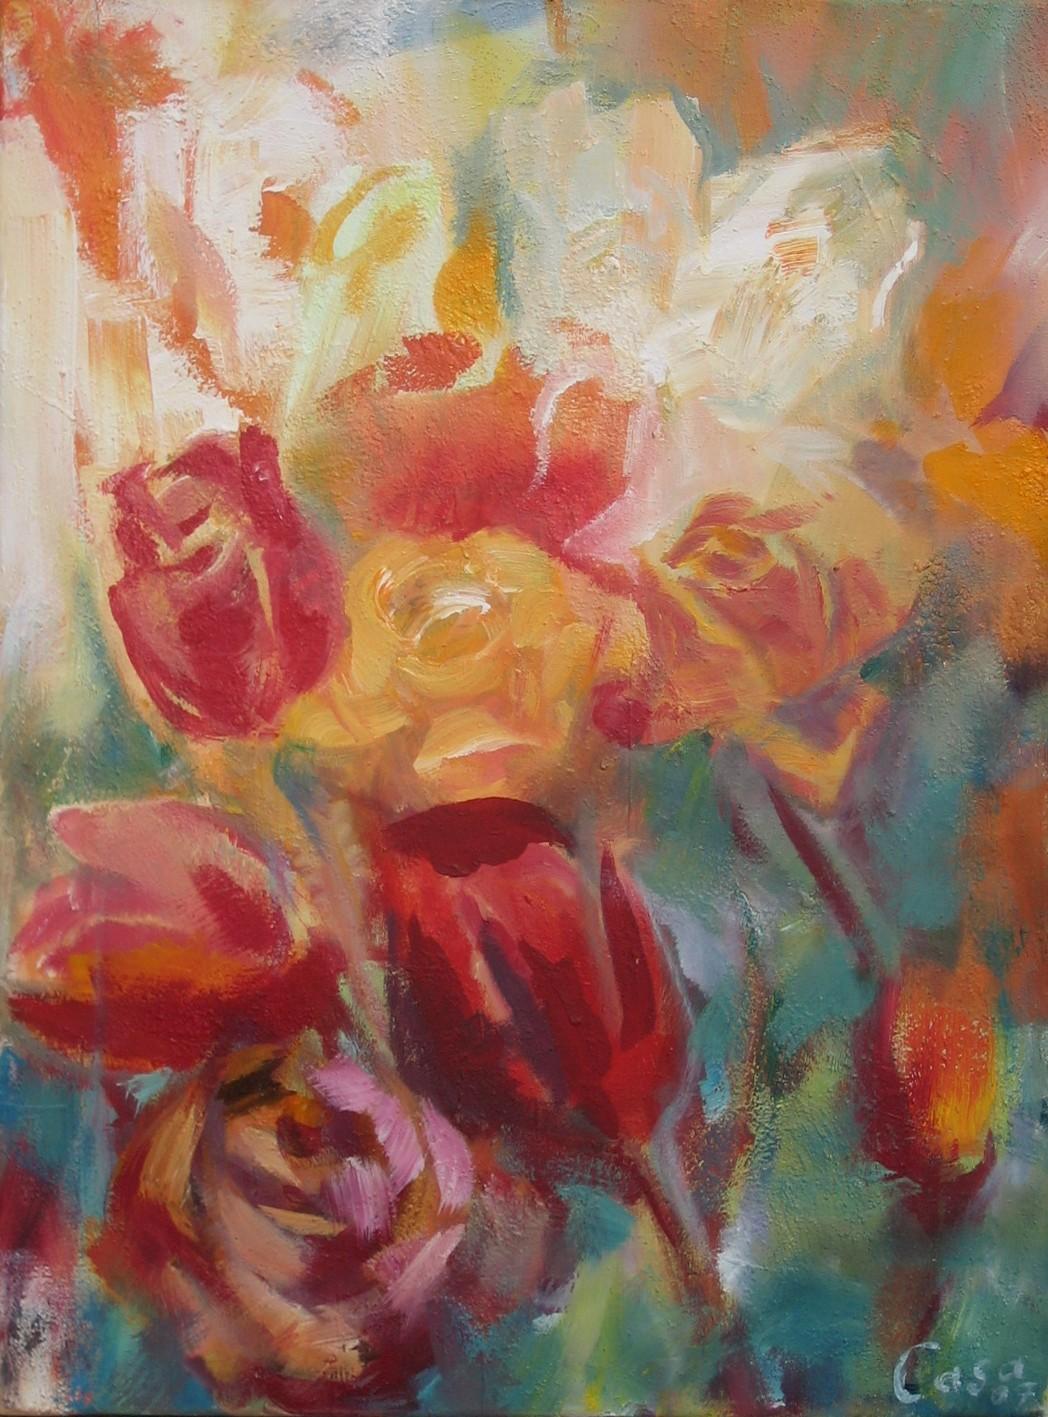 ohne Titel - Acryl auf Leinwand - 70 x 50 cm